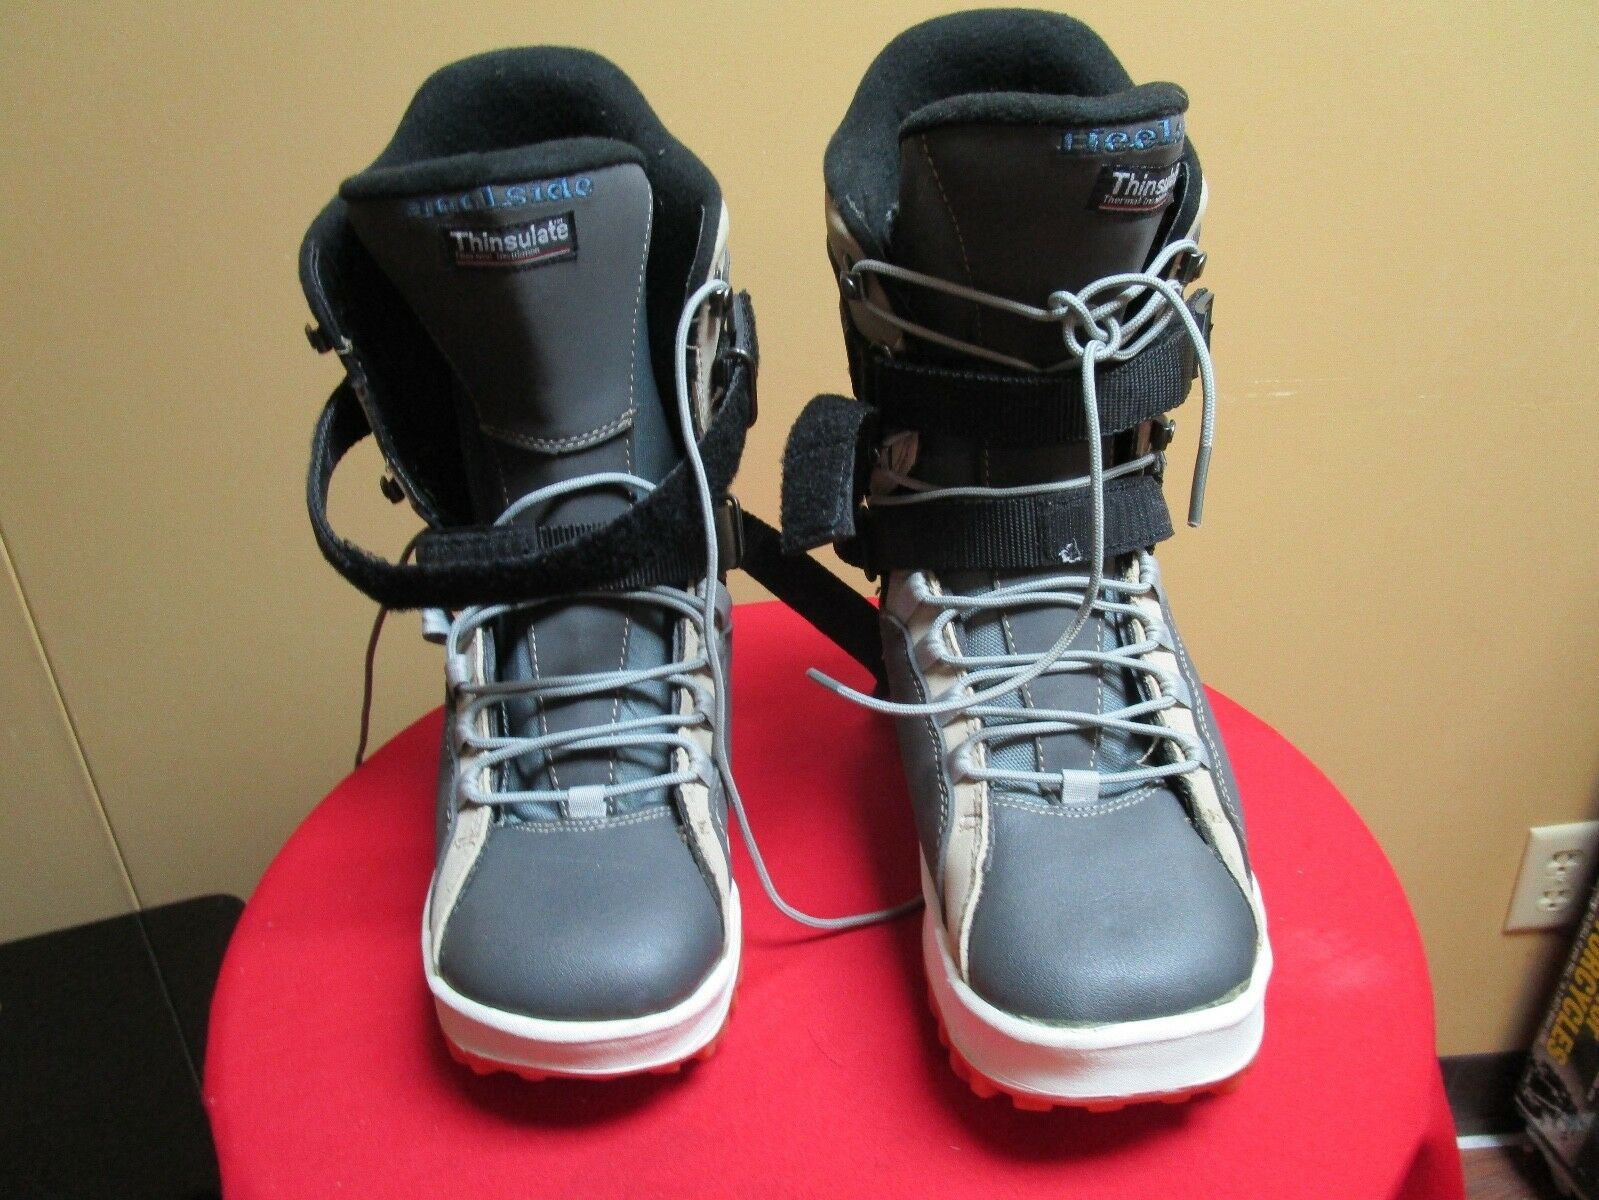 Heelside Explorer Boots Size 10